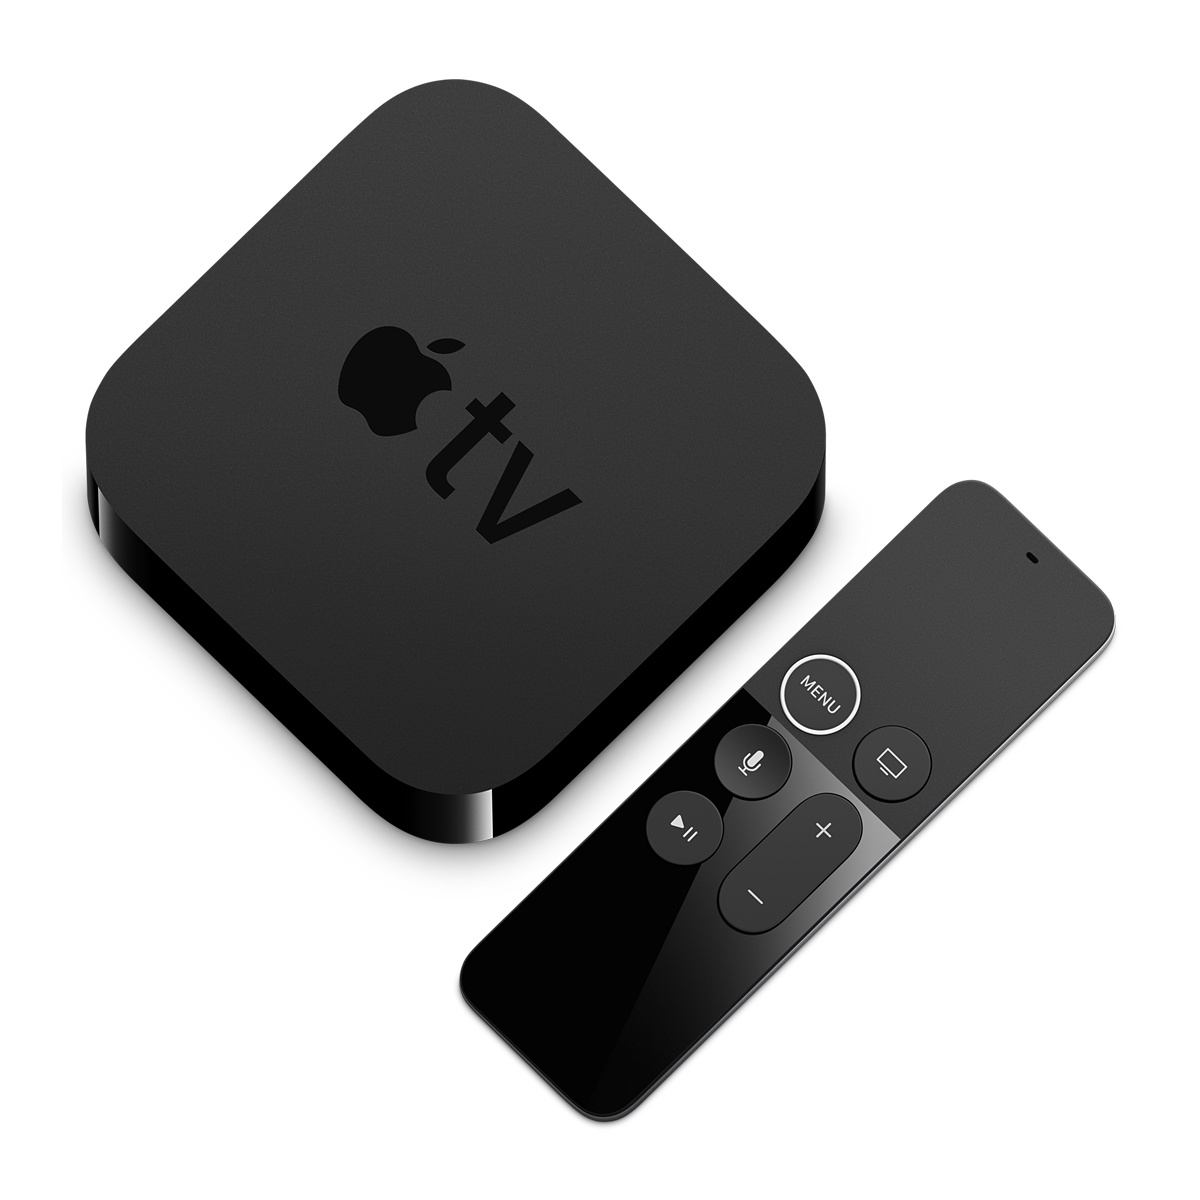 2022274-Apple-TV-32-GB-Wi-Fi-Collegamento-ethernet-LAN-Nero-Full-HD-Apple-TV-4